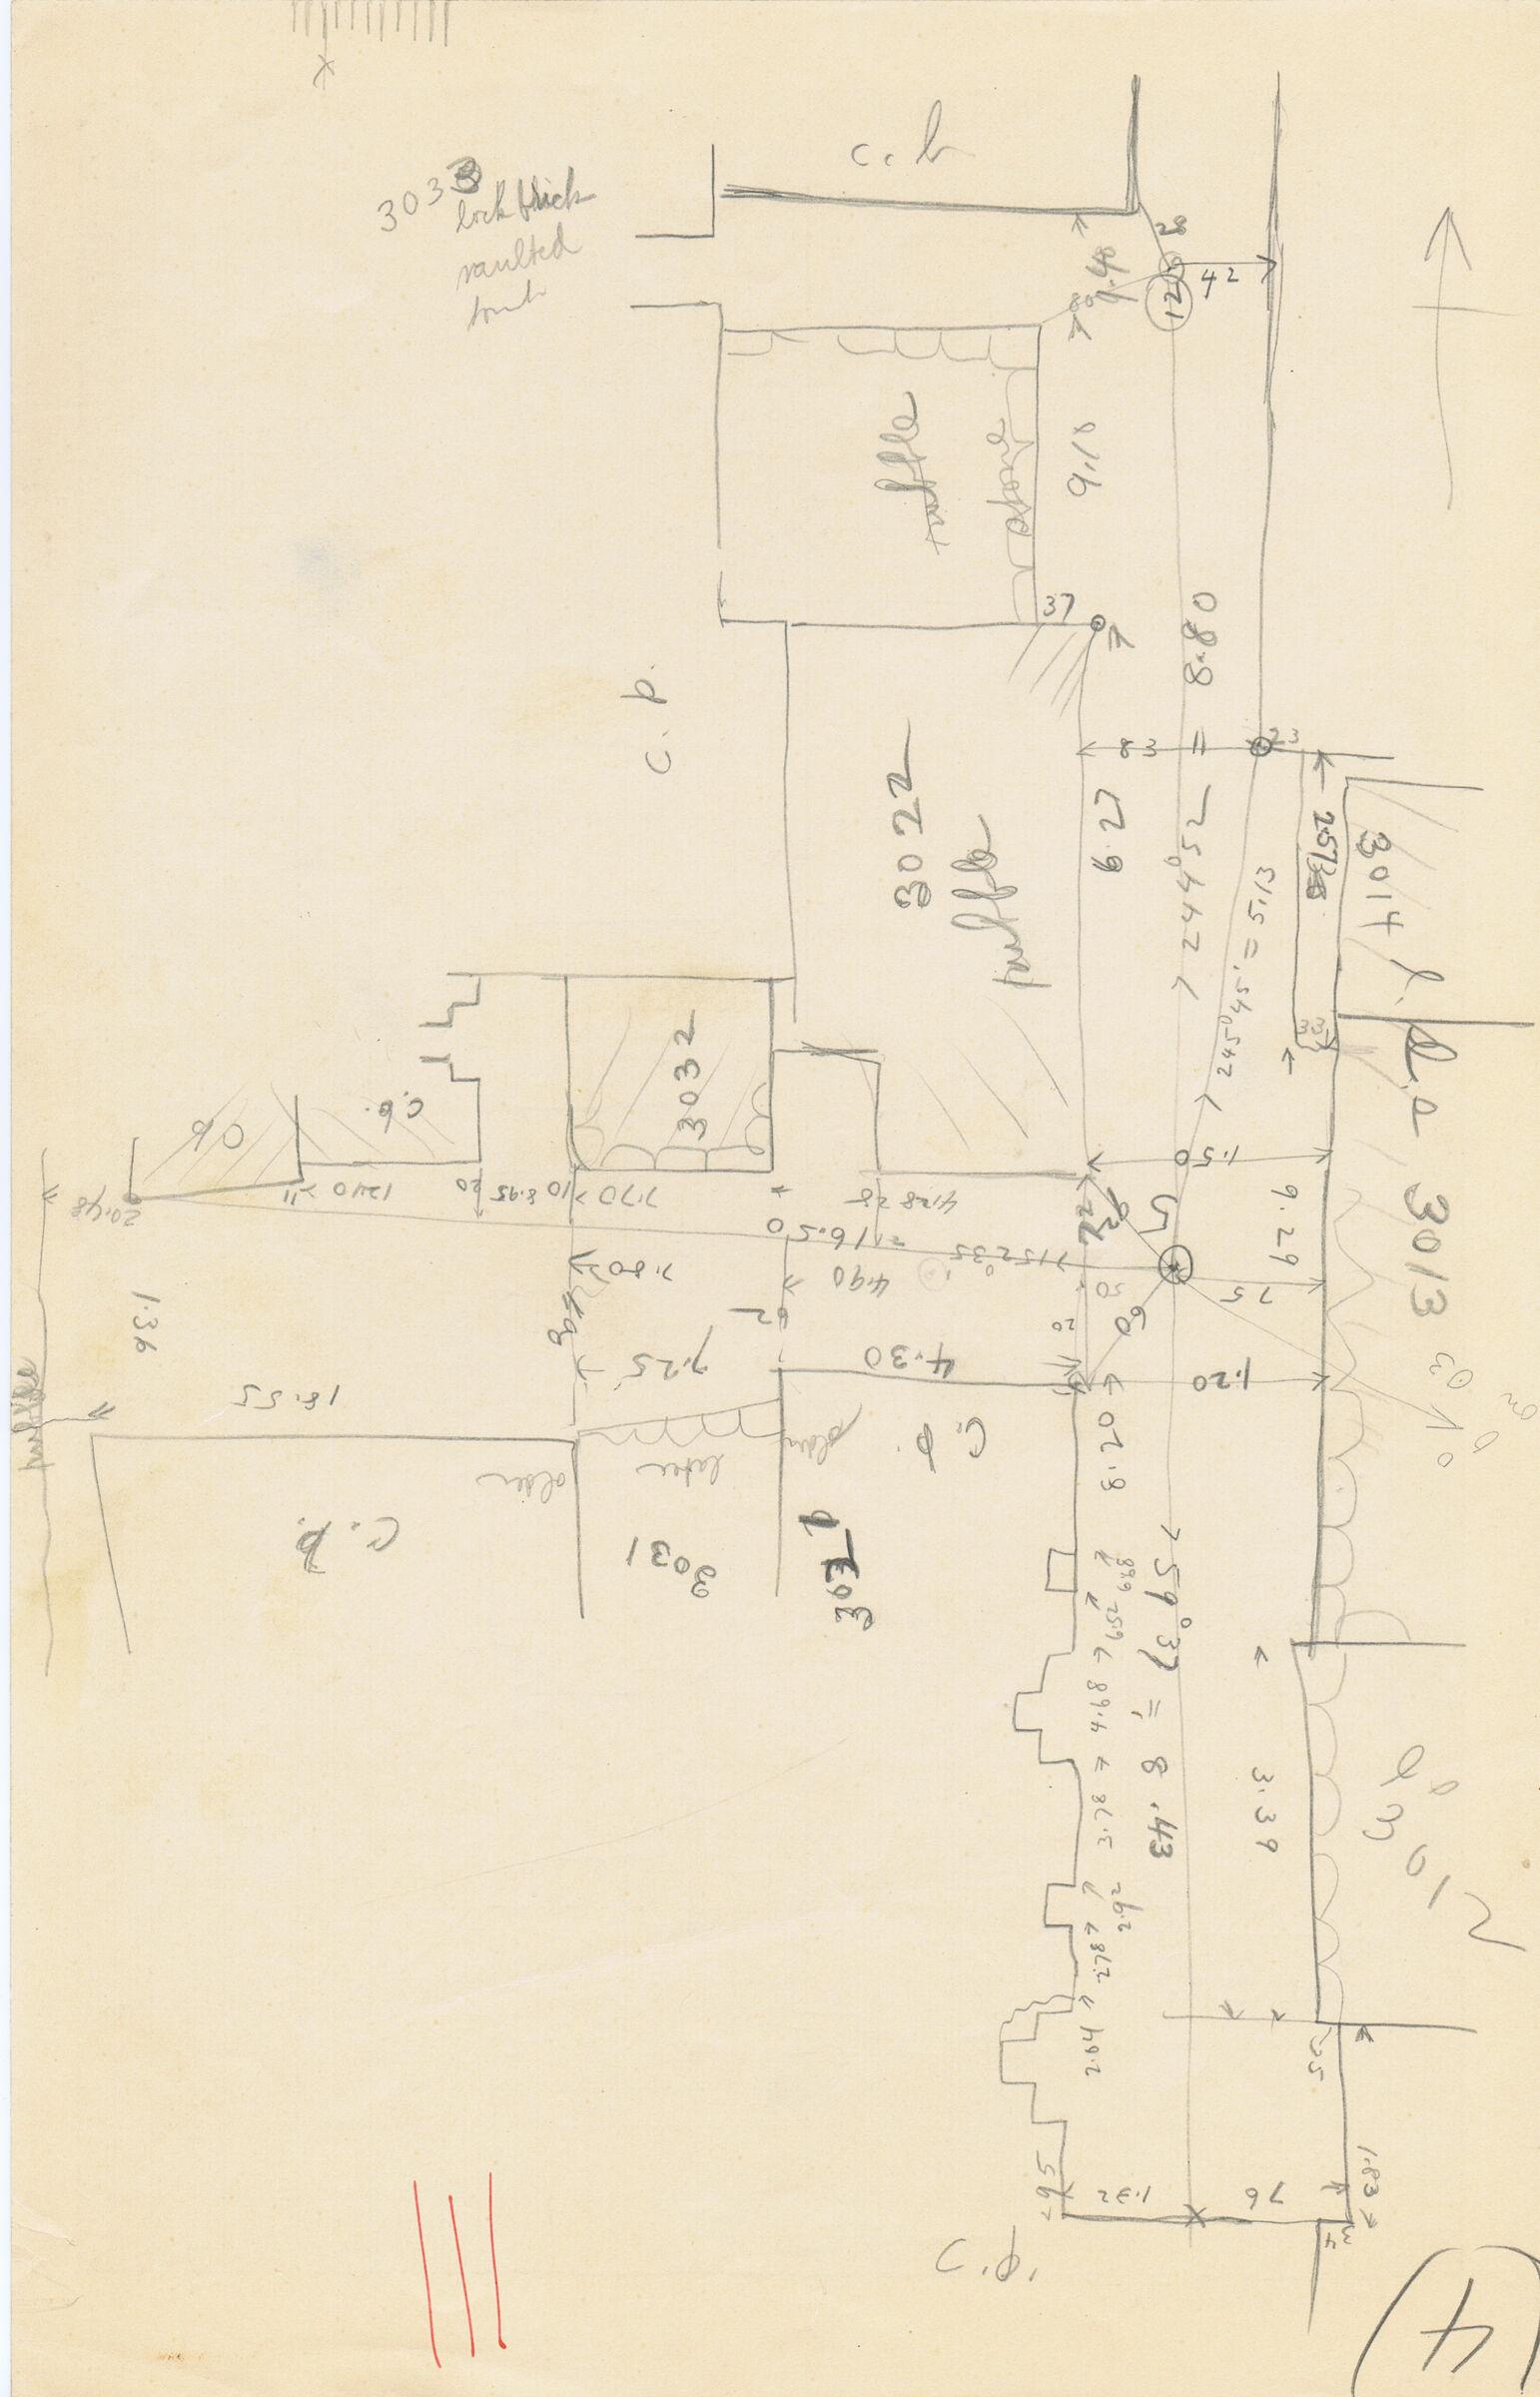 Maps and plans: Sketch plan of G 3012, G 3013+3014, G 3021, G 3022, G 3031, G 3032, G 3033, and G 3036